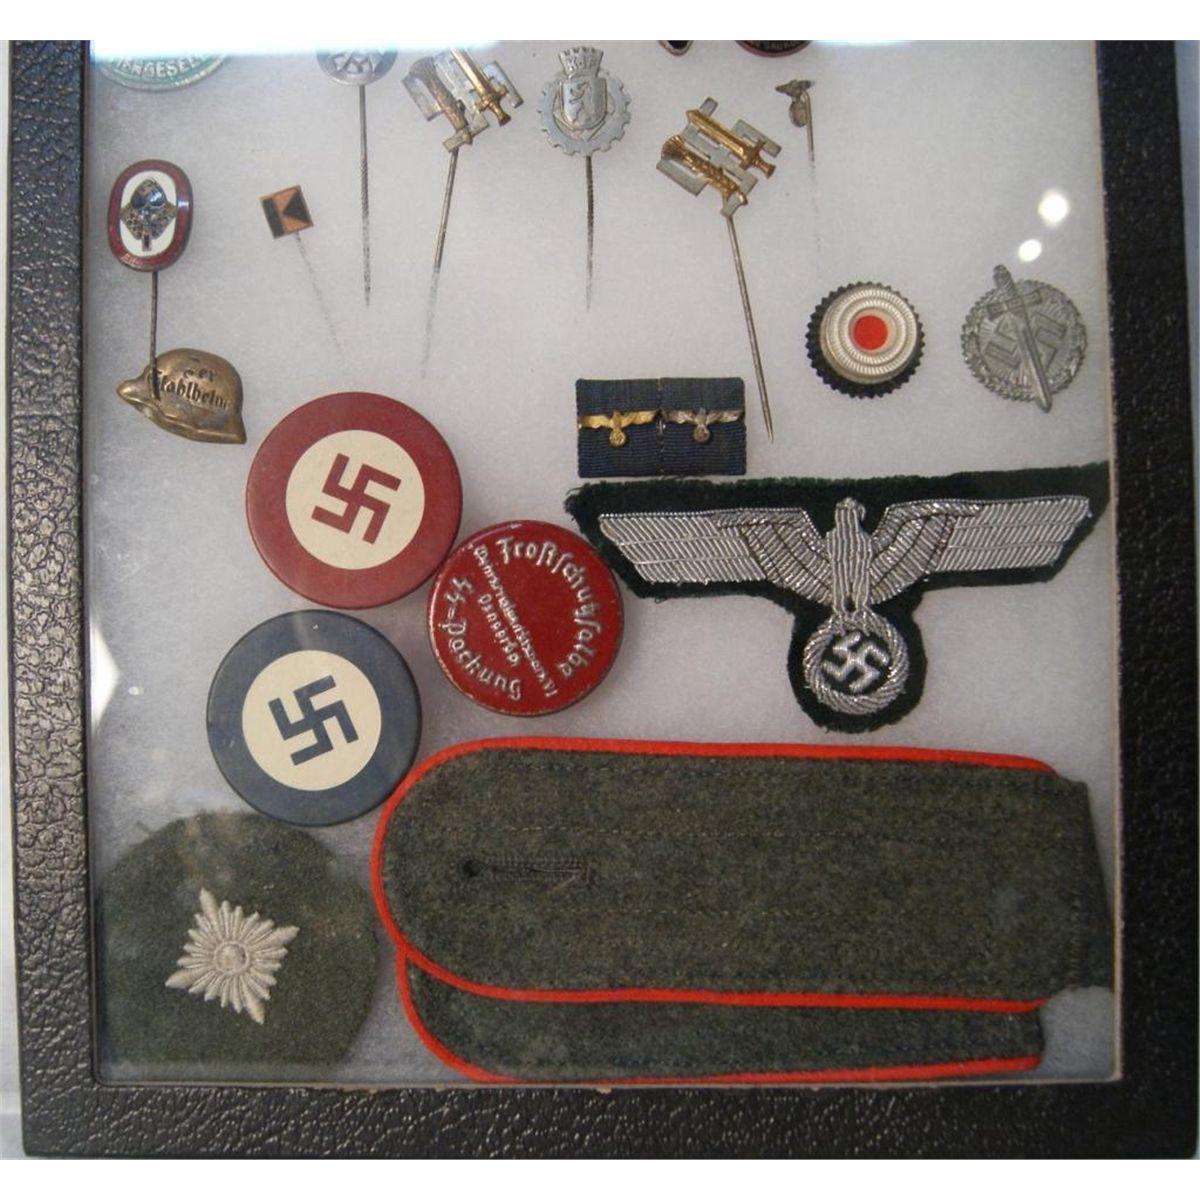 Cased Collection of Rare German WWII memorabilia